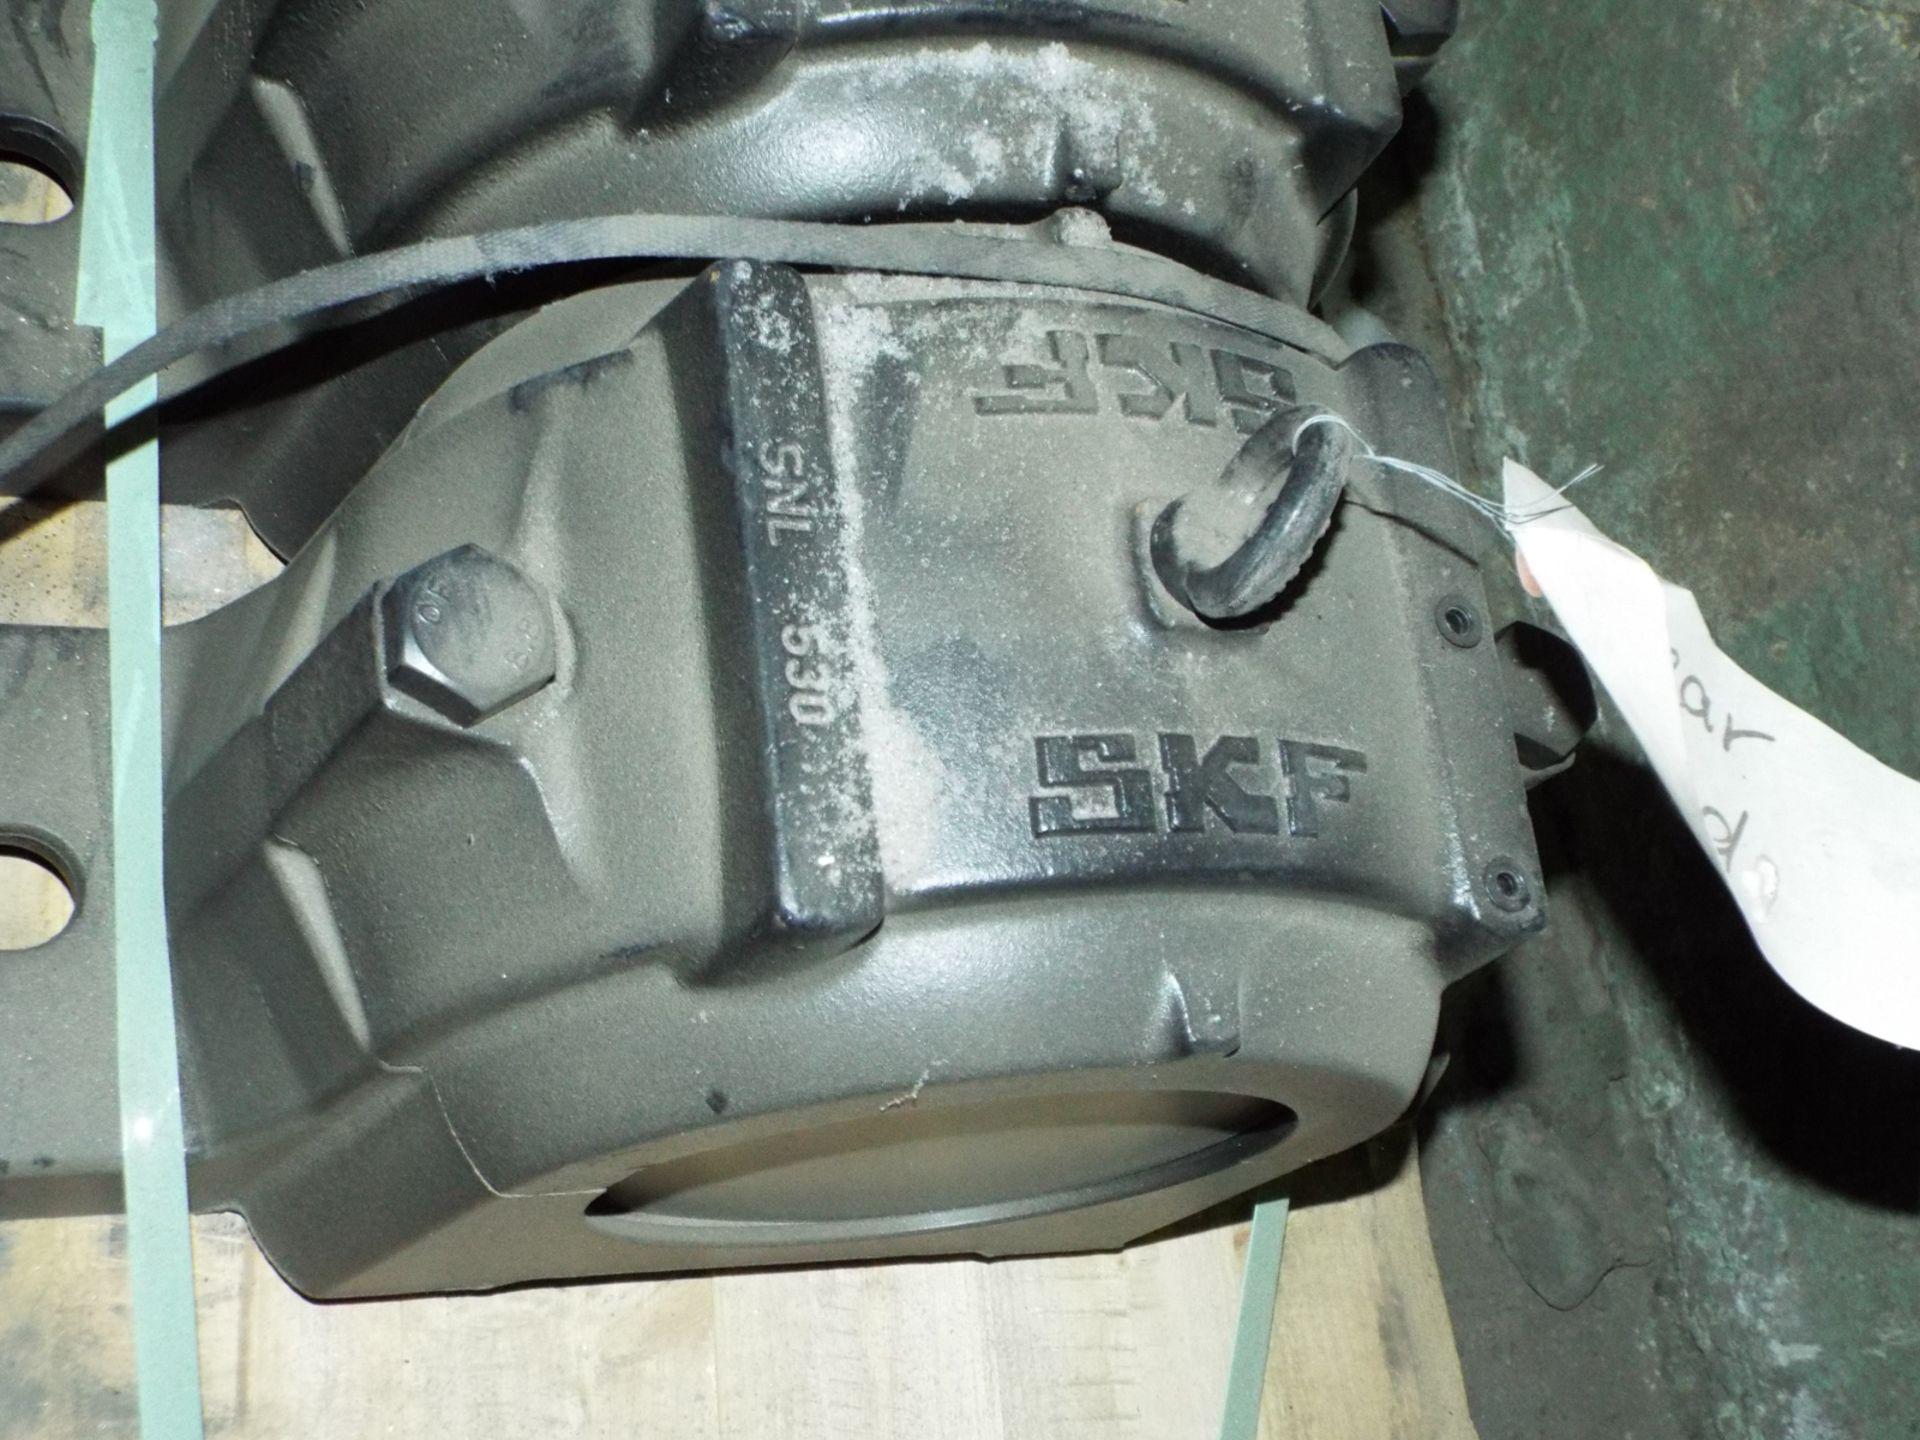 Lot 46 - (2) SKF SNL530 PILLOW BLOCK BEARING HOUSINGS (PLT NS-3Y)